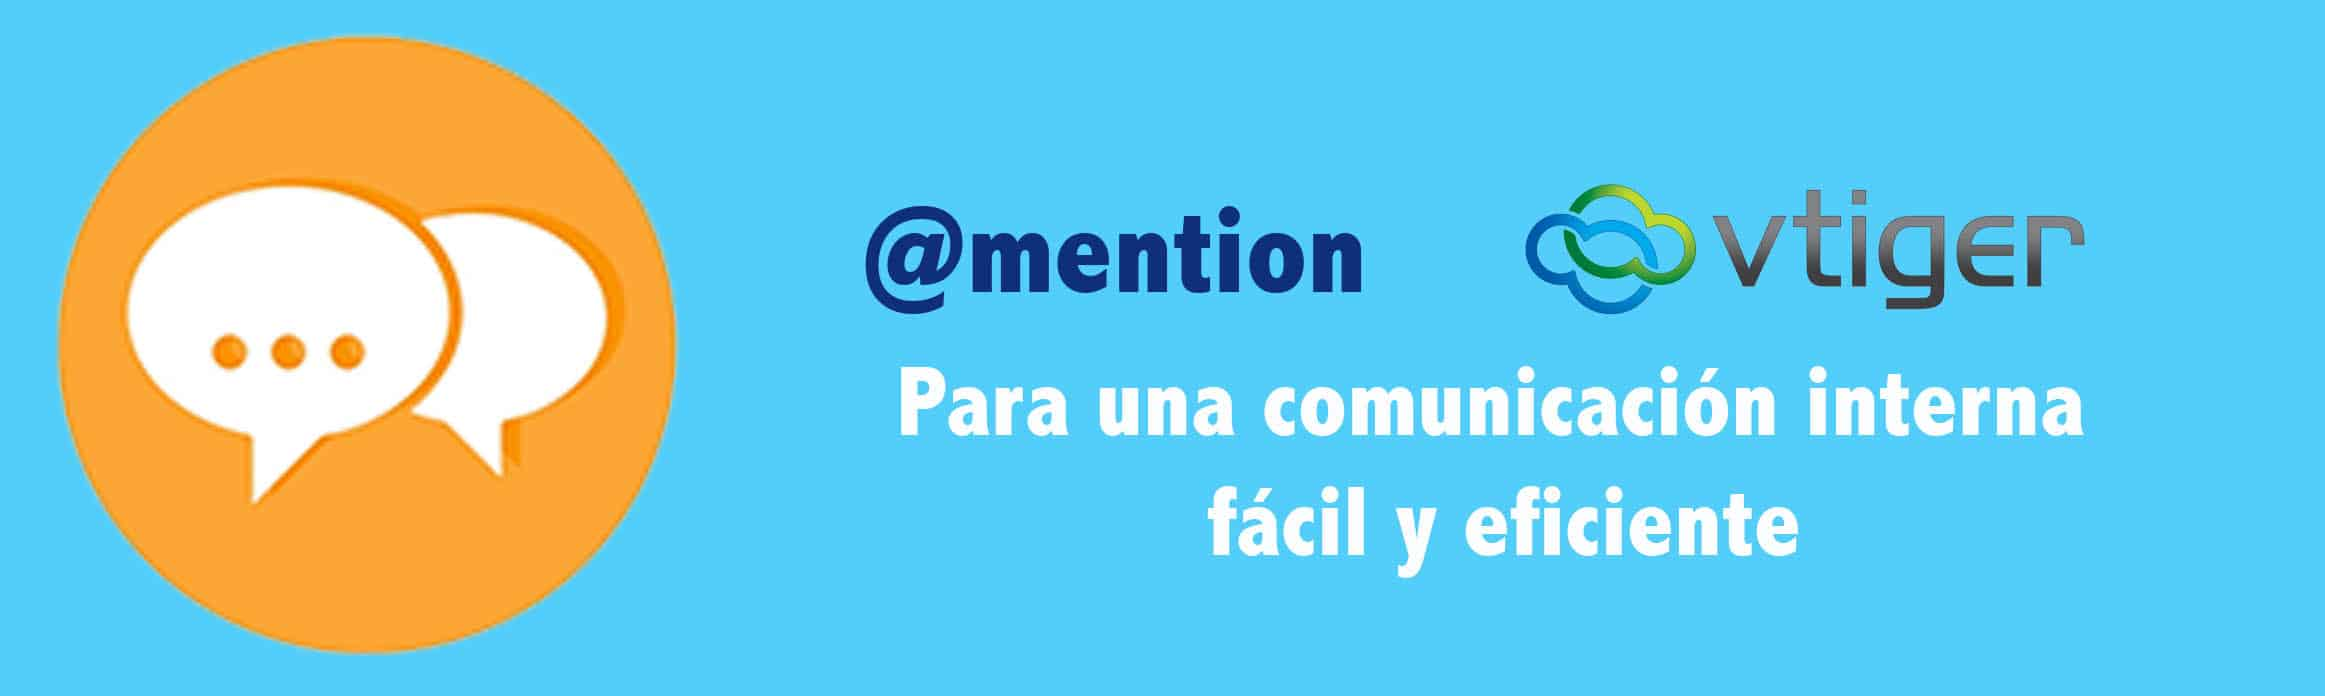 función crm @mention vtiger